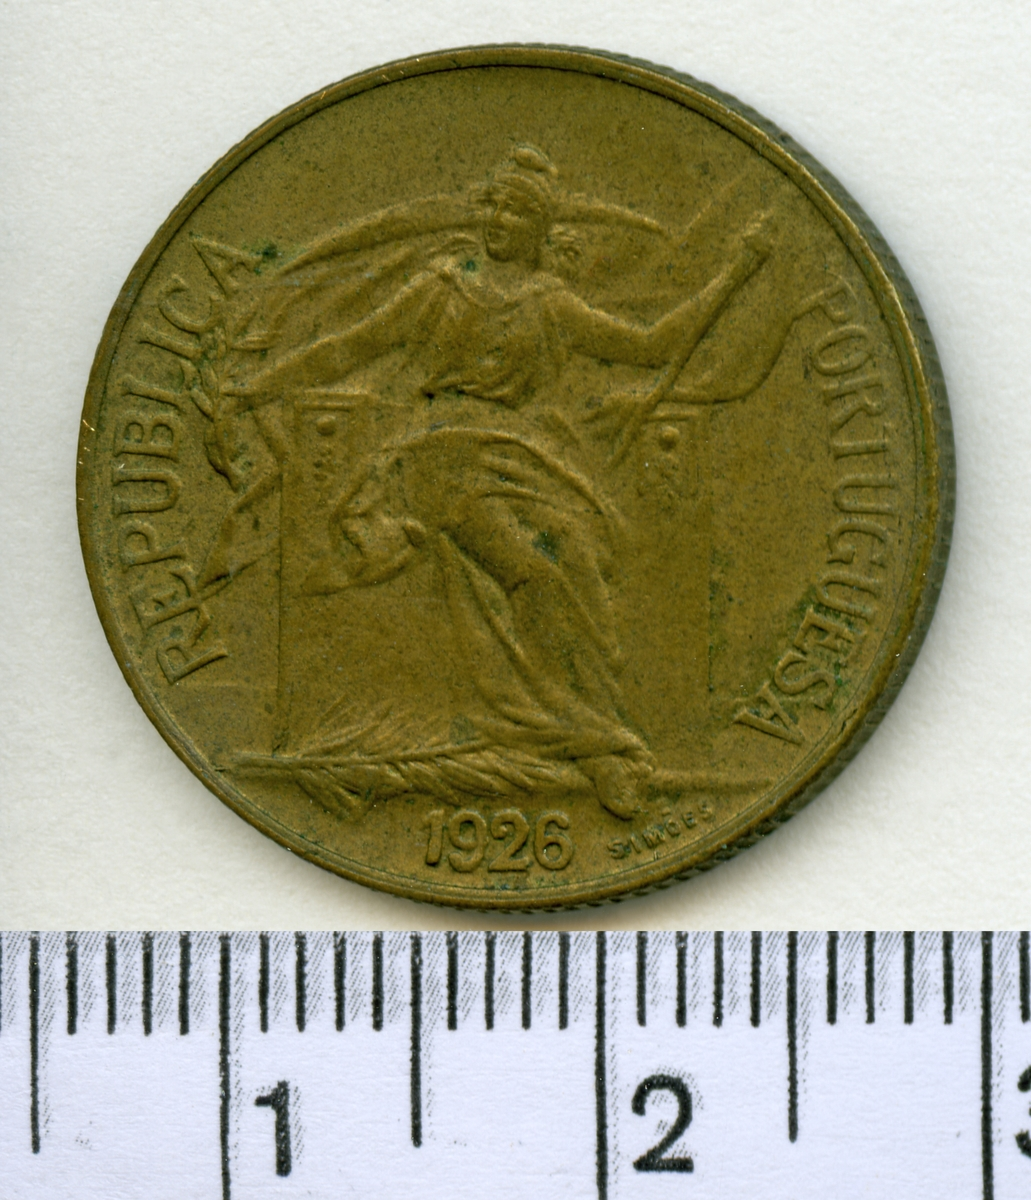 50 Centavos 1926 Portugal.